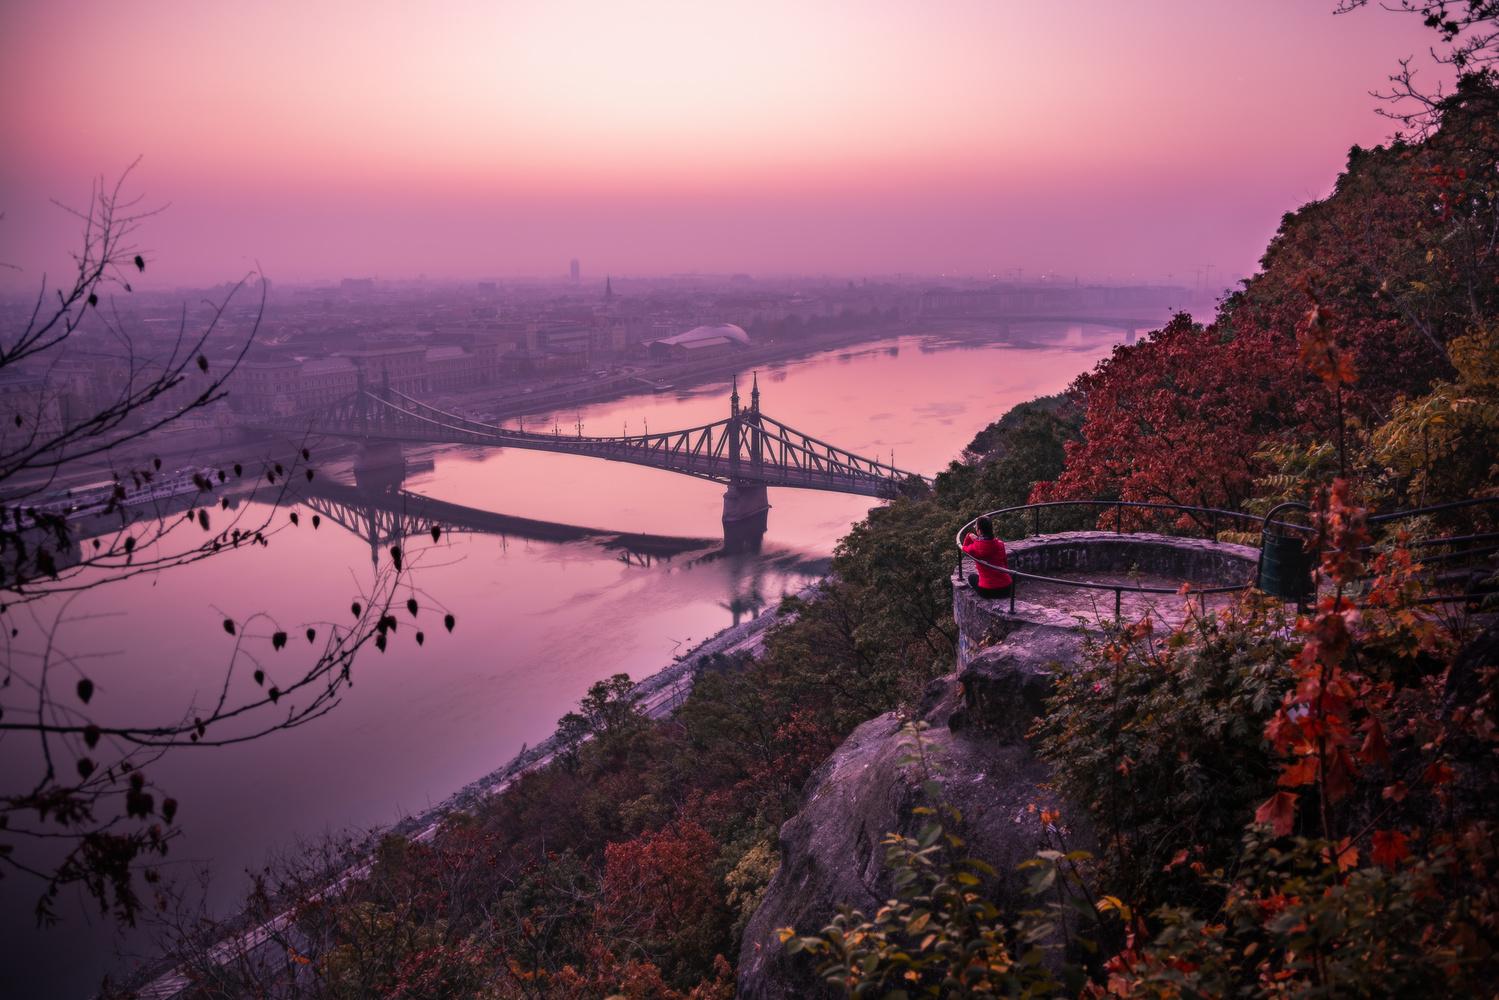 amethyst sunrise by Krisztian Kapitany